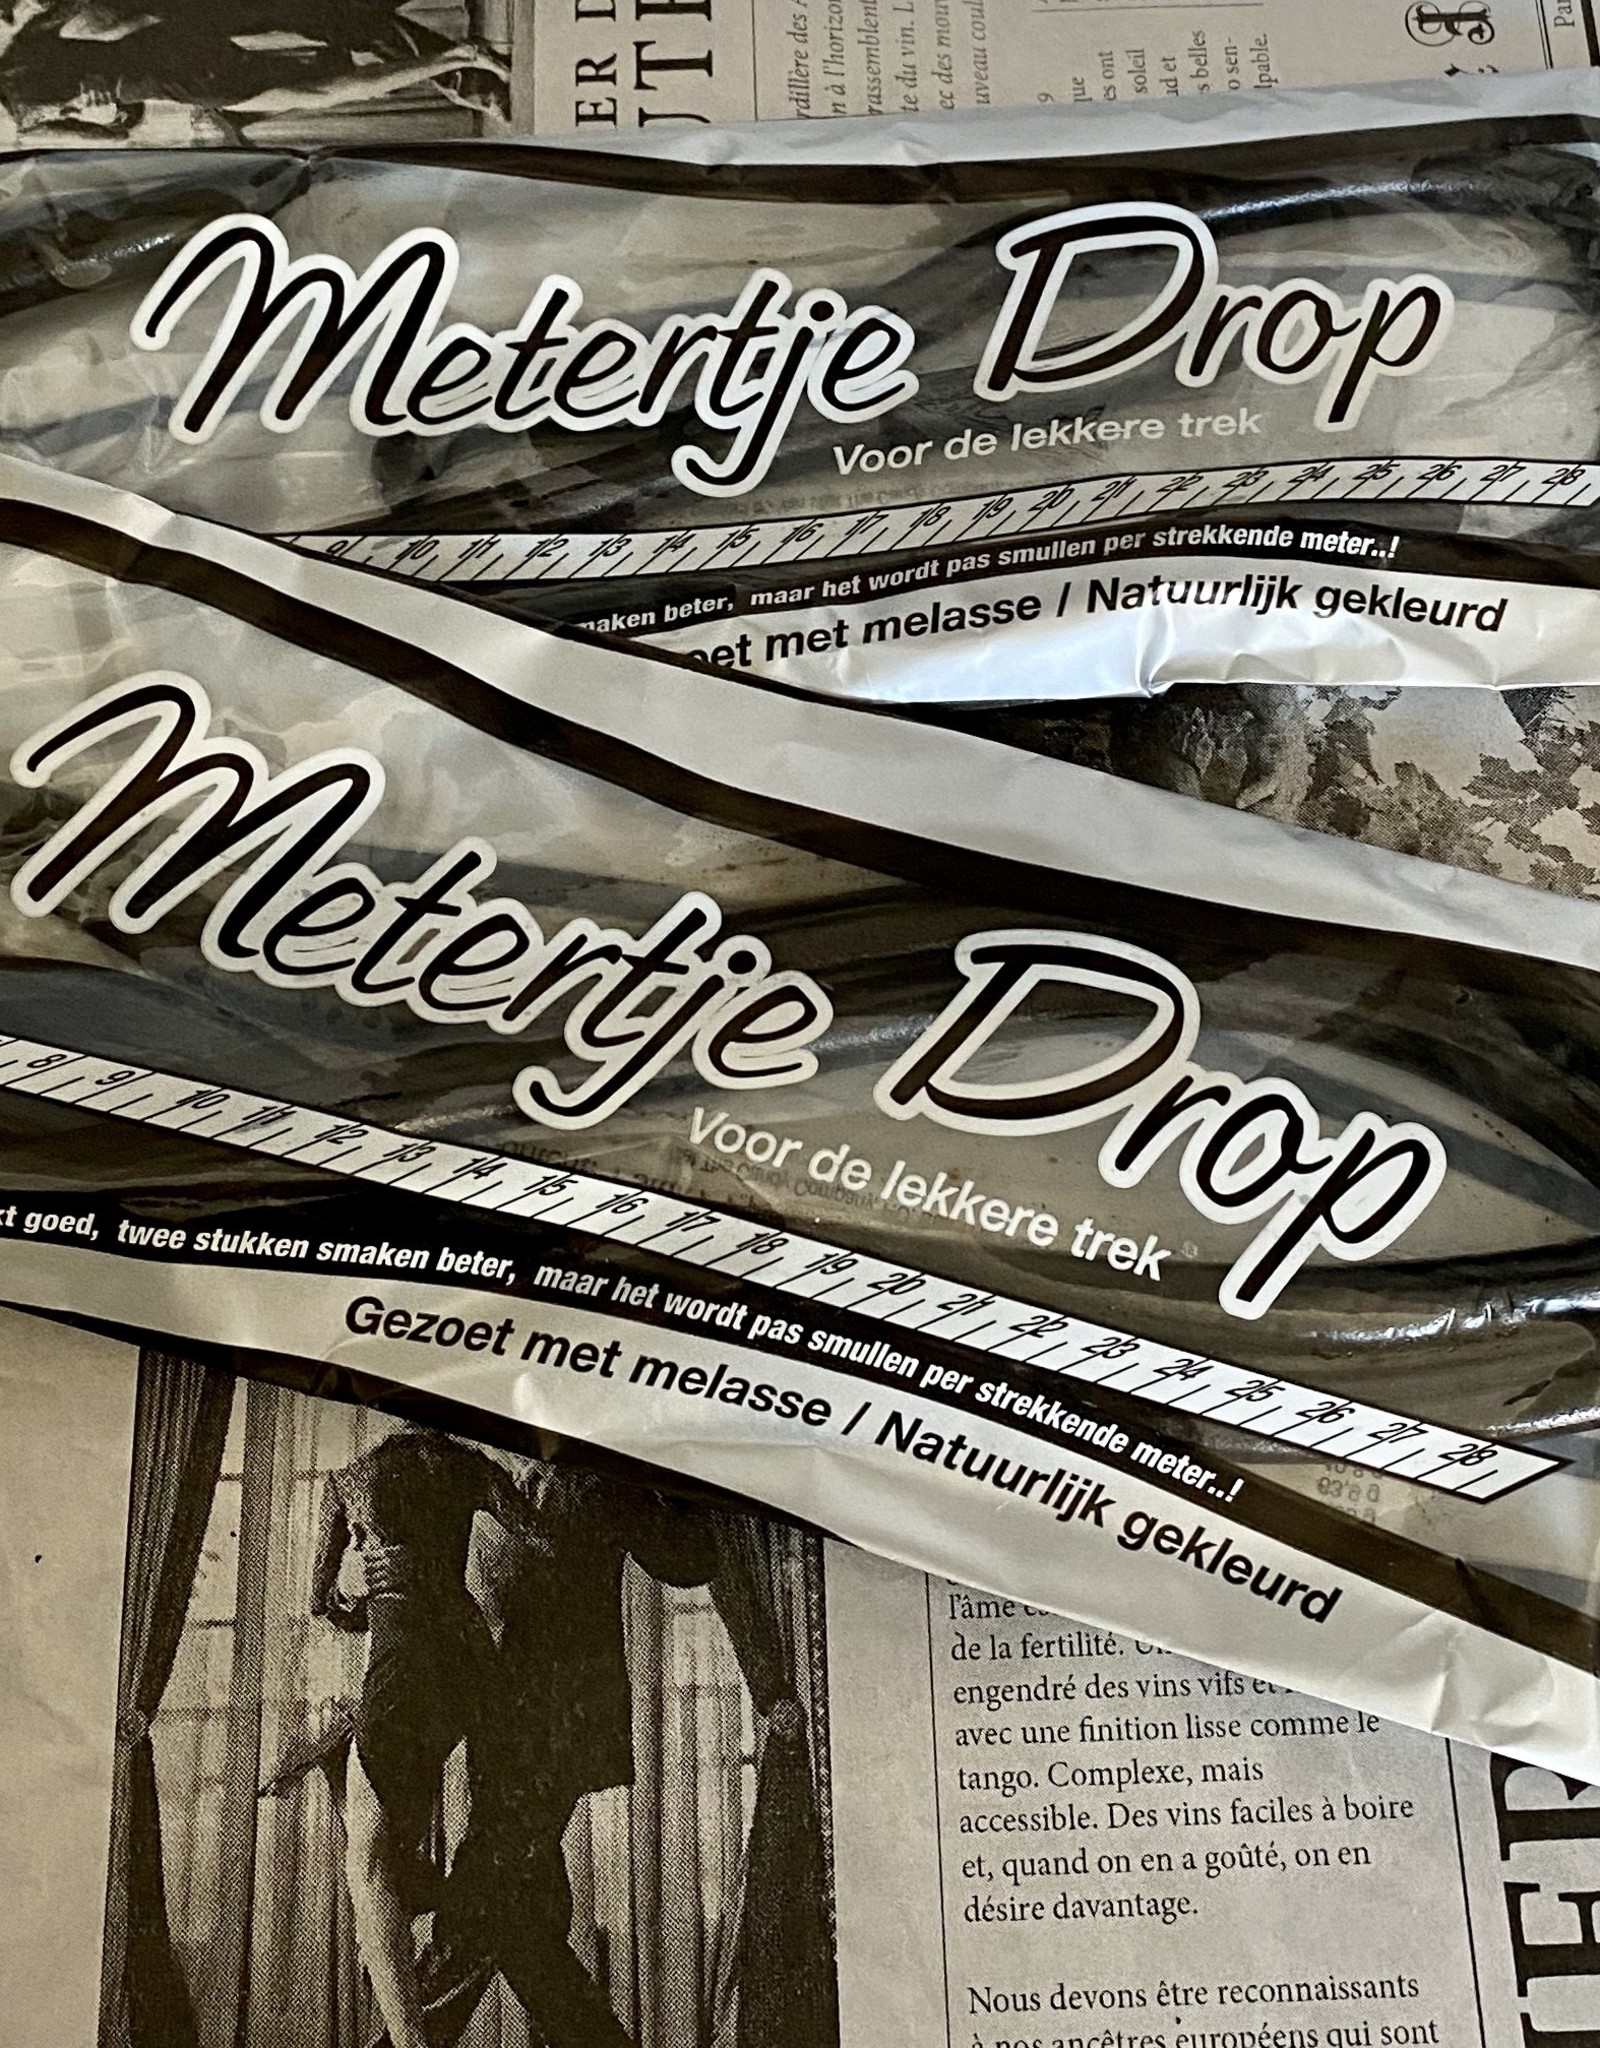 Metertje Drop